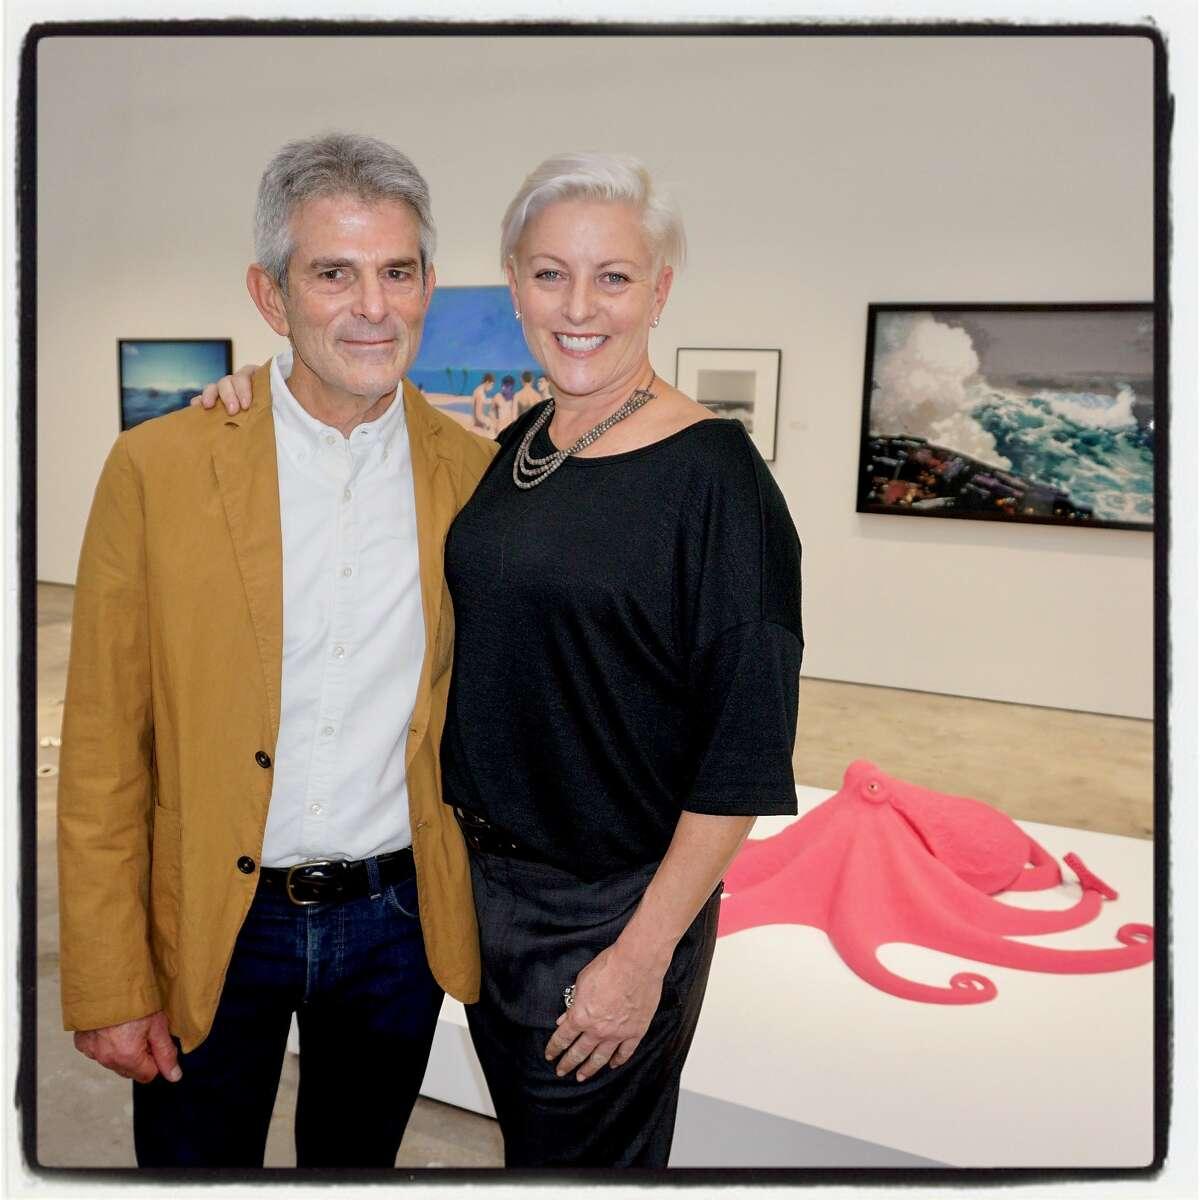 Gallerist Jeffrey Fraenkel and 500 Capp Street founder Carlie Wilmans at the McEvoy Arts Foundation opening. Oct. 28, 2017.